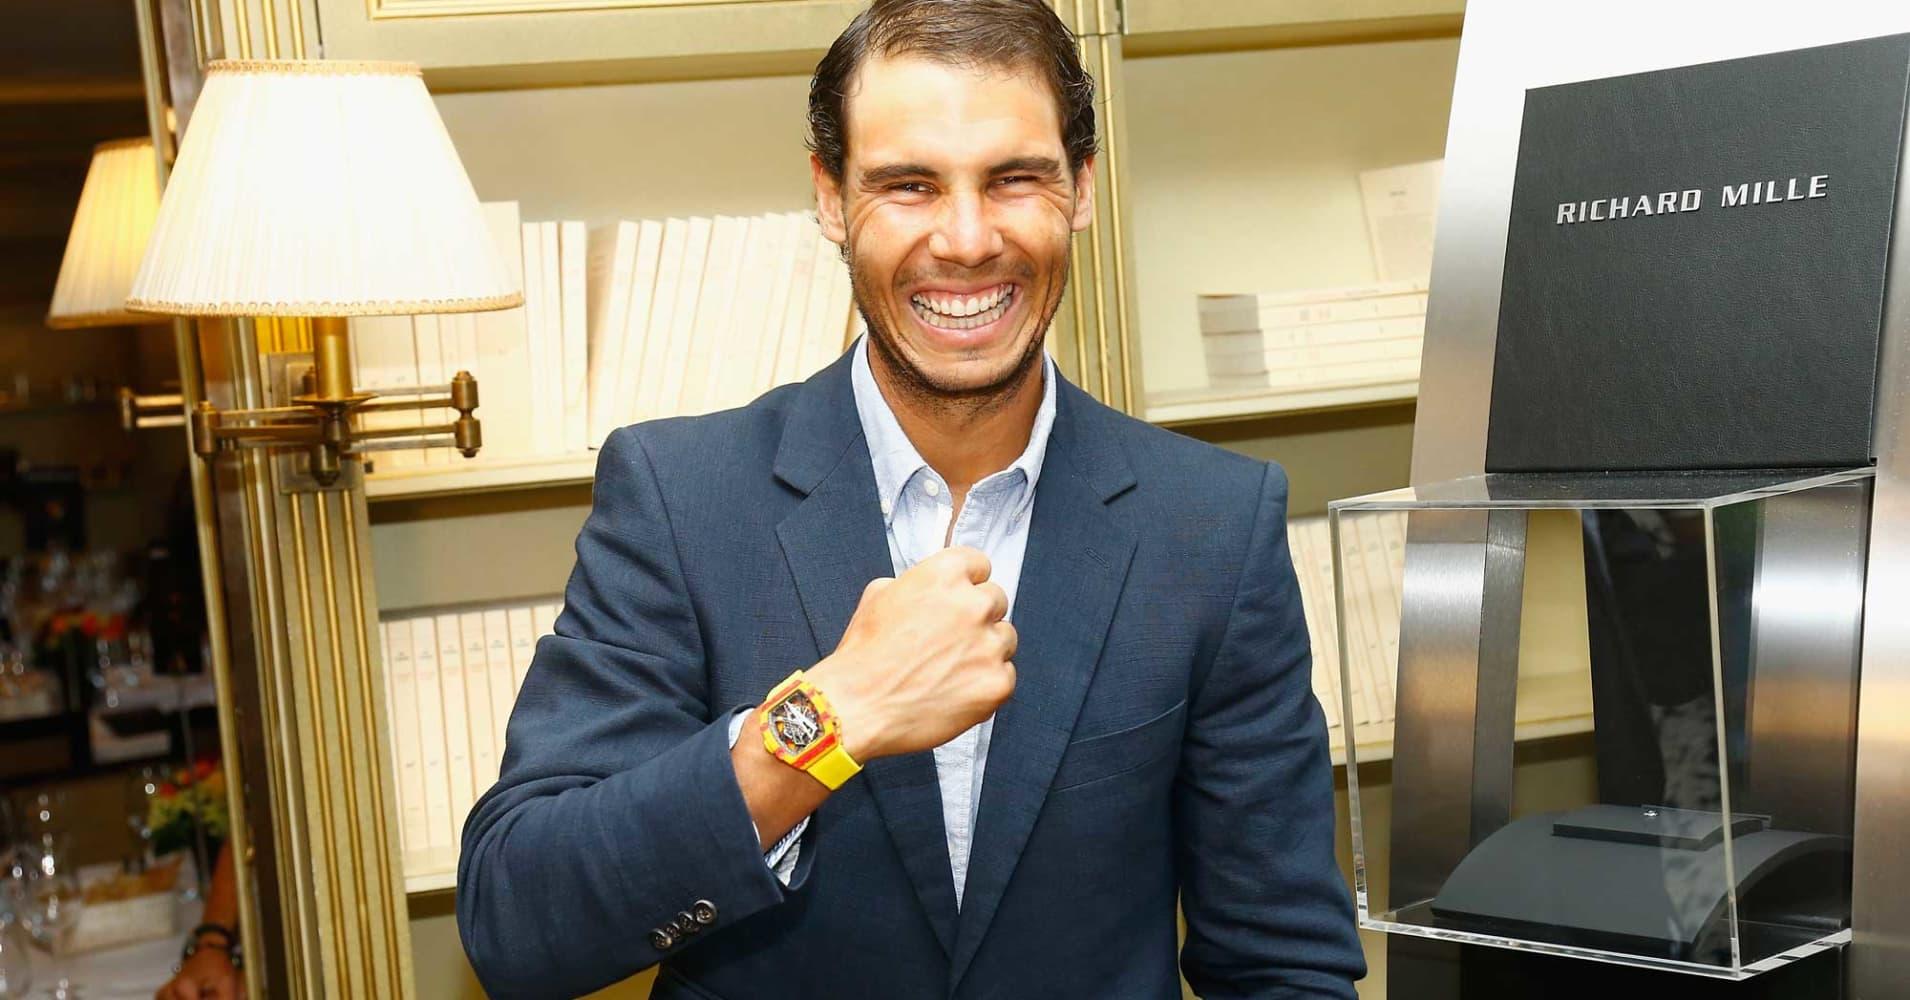 Tennis pro Rafa Nadal s new $725 000 Richard Mille watch